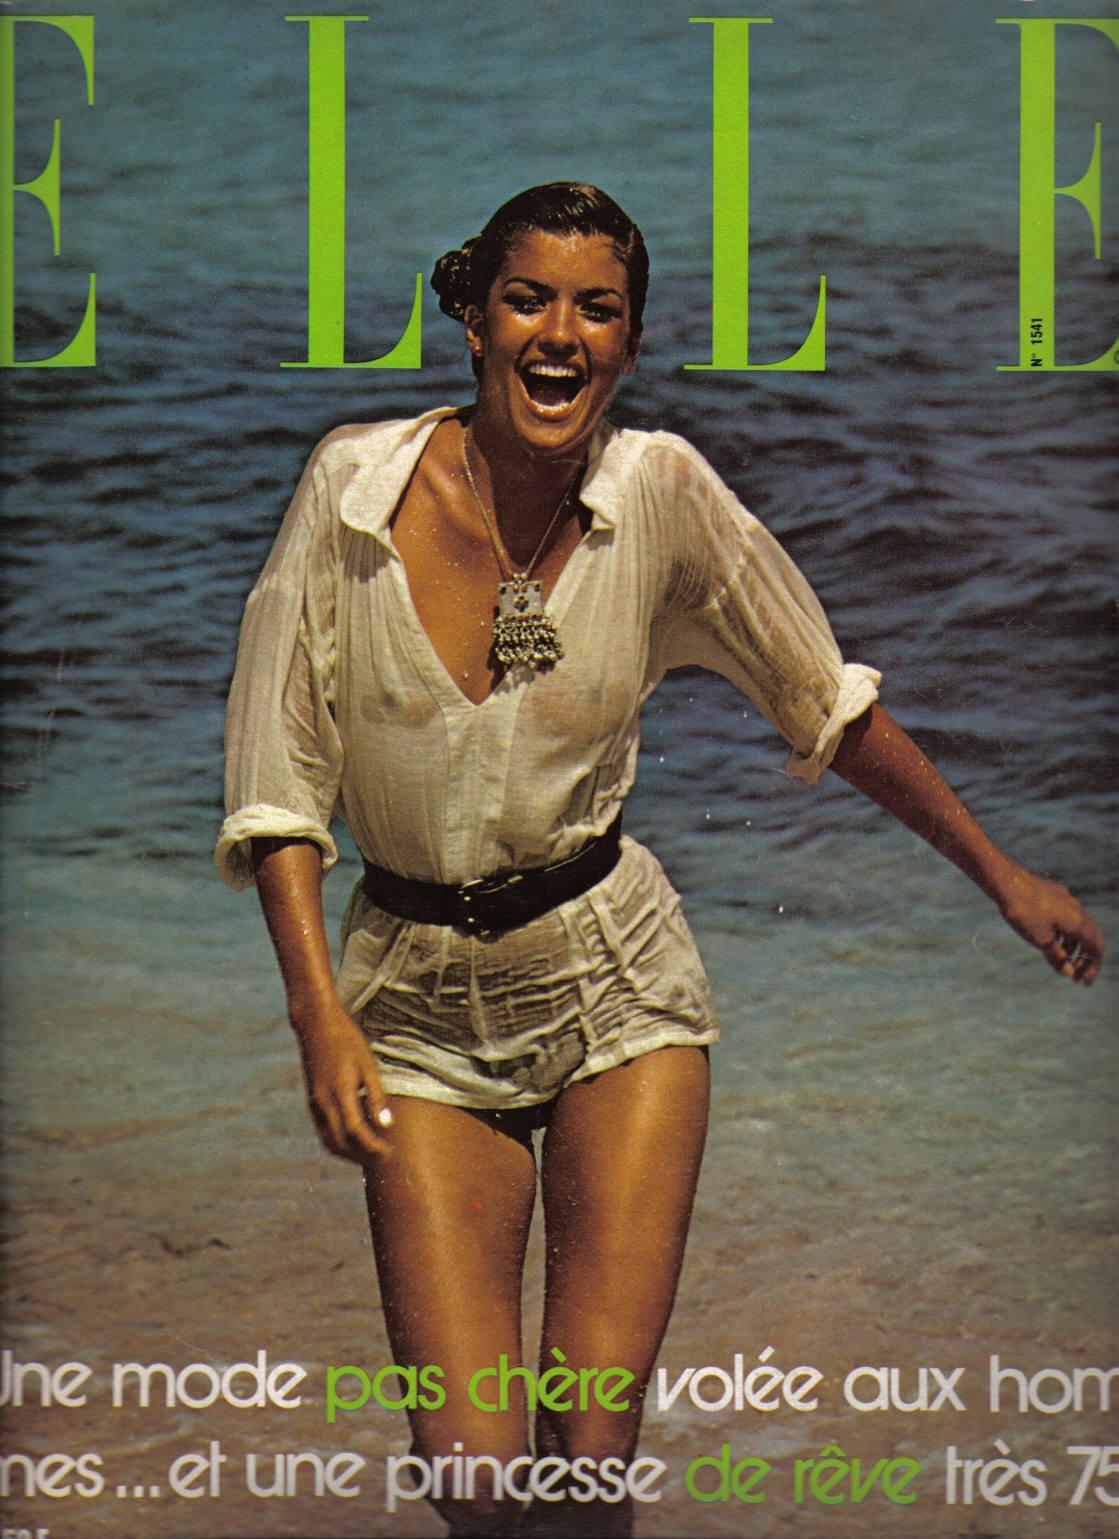 http://1.bp.blogspot.com/_zeh3qtyepq4/TKJRsramnYI/AAAAAAAAA8k/UzwwMUTgUZI/s1600/9f5e1d1613b456e8_Elle_France_July21_1975_-_Janice_Dickinson.jpg